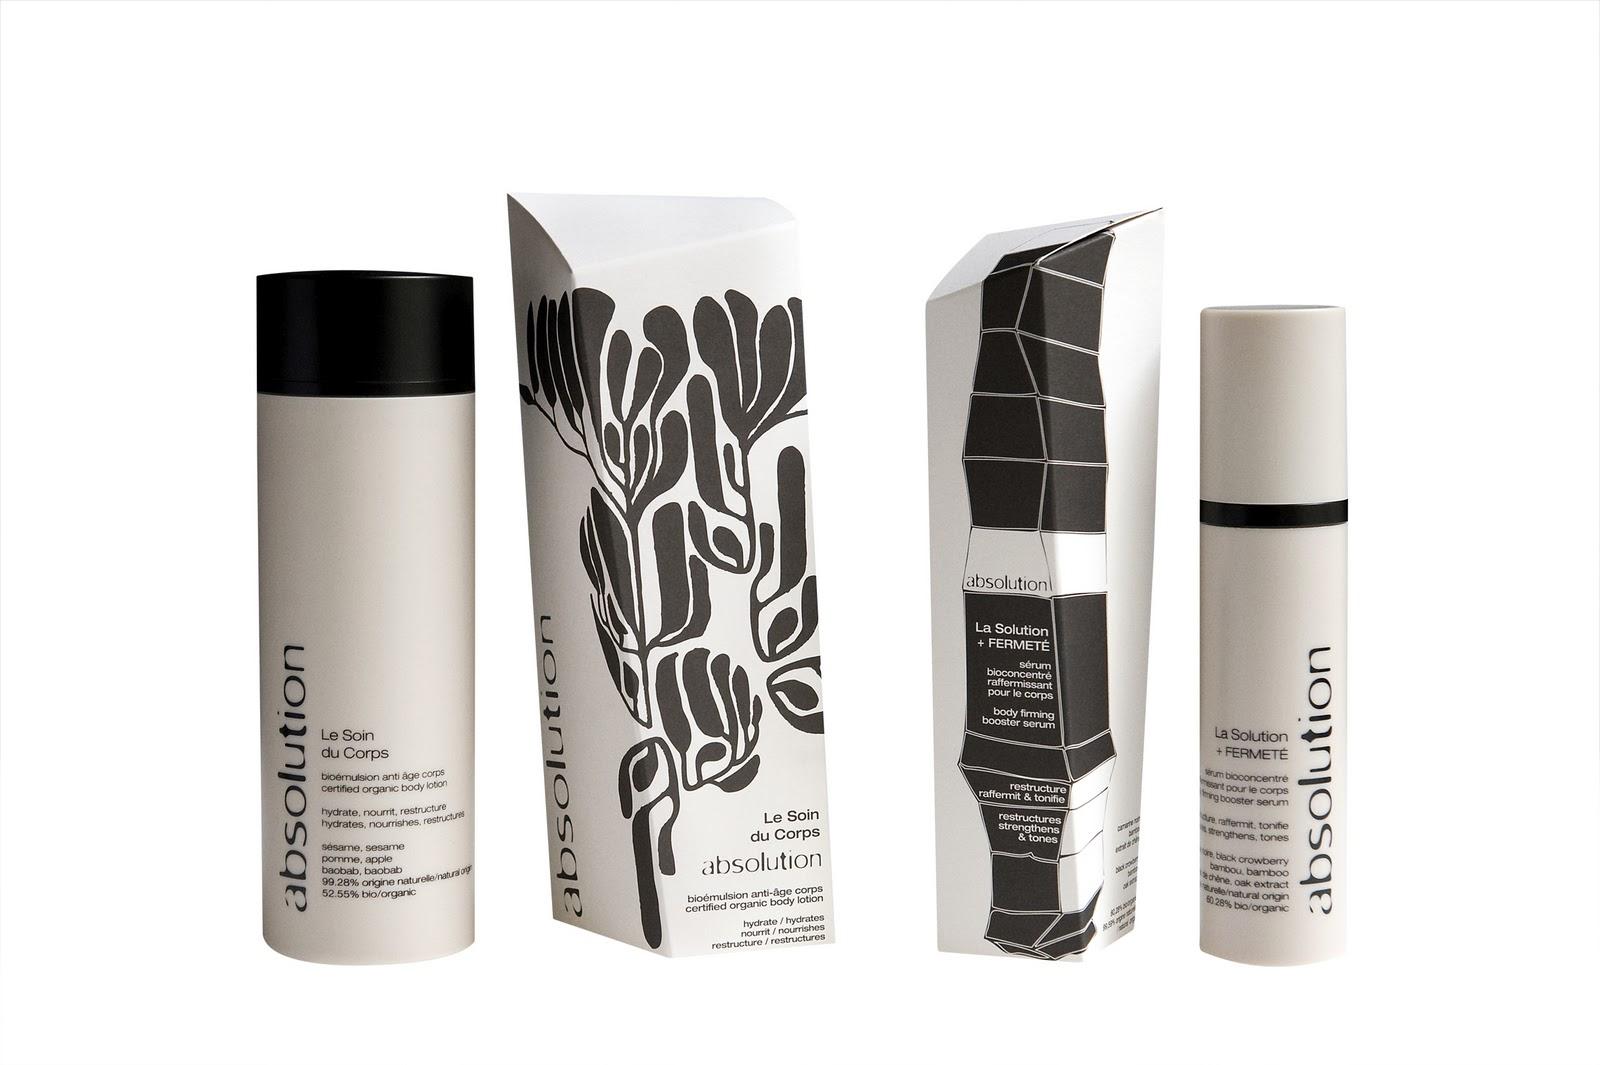 cosmetique bio luxe